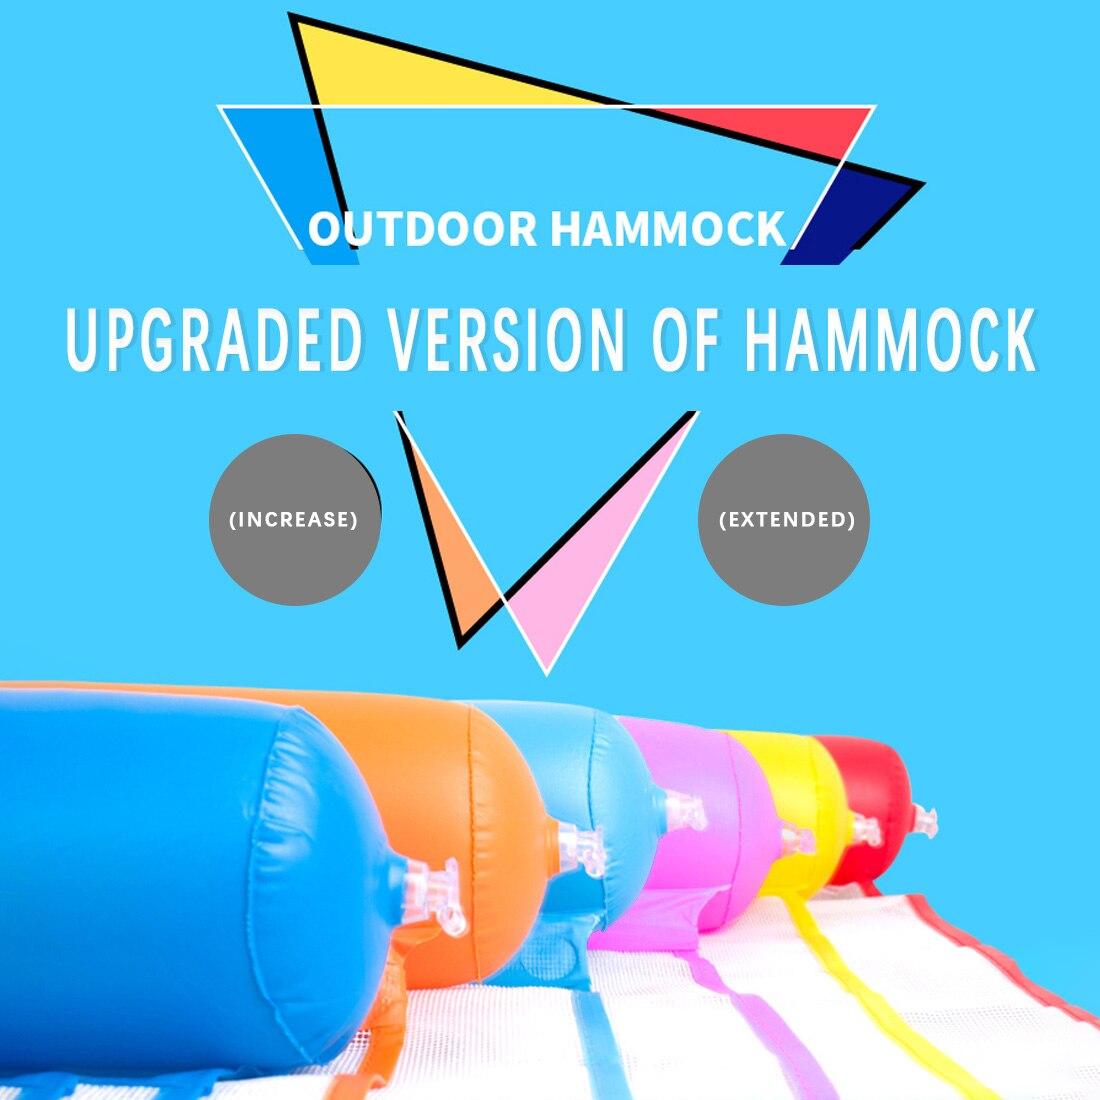 Купить с кэшбэком Water hammock  New Summer Foldable Floating Row Swimming pool inflatable floating Air Mattress Swimming Pool Seat with Hand Pump